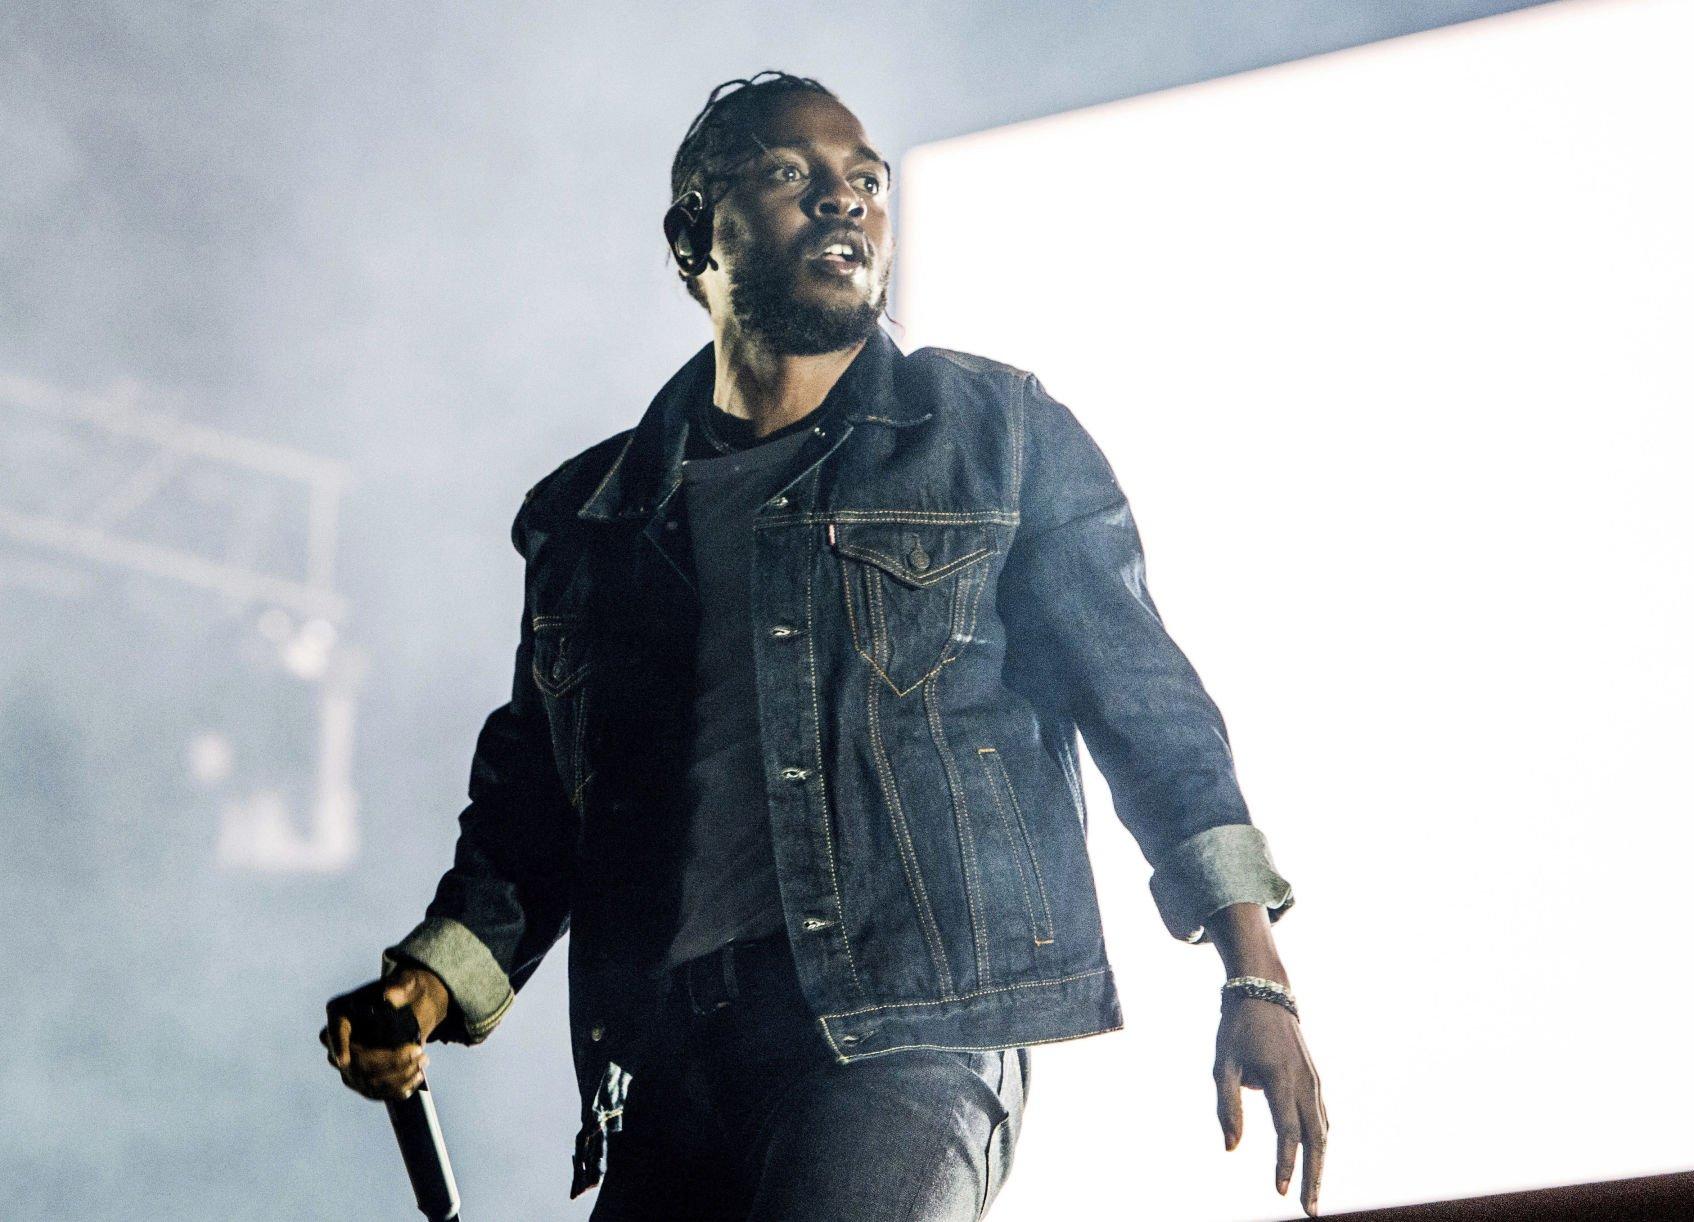 Kendrick Lamar leads contenders for MTV's non-gendered VMAs